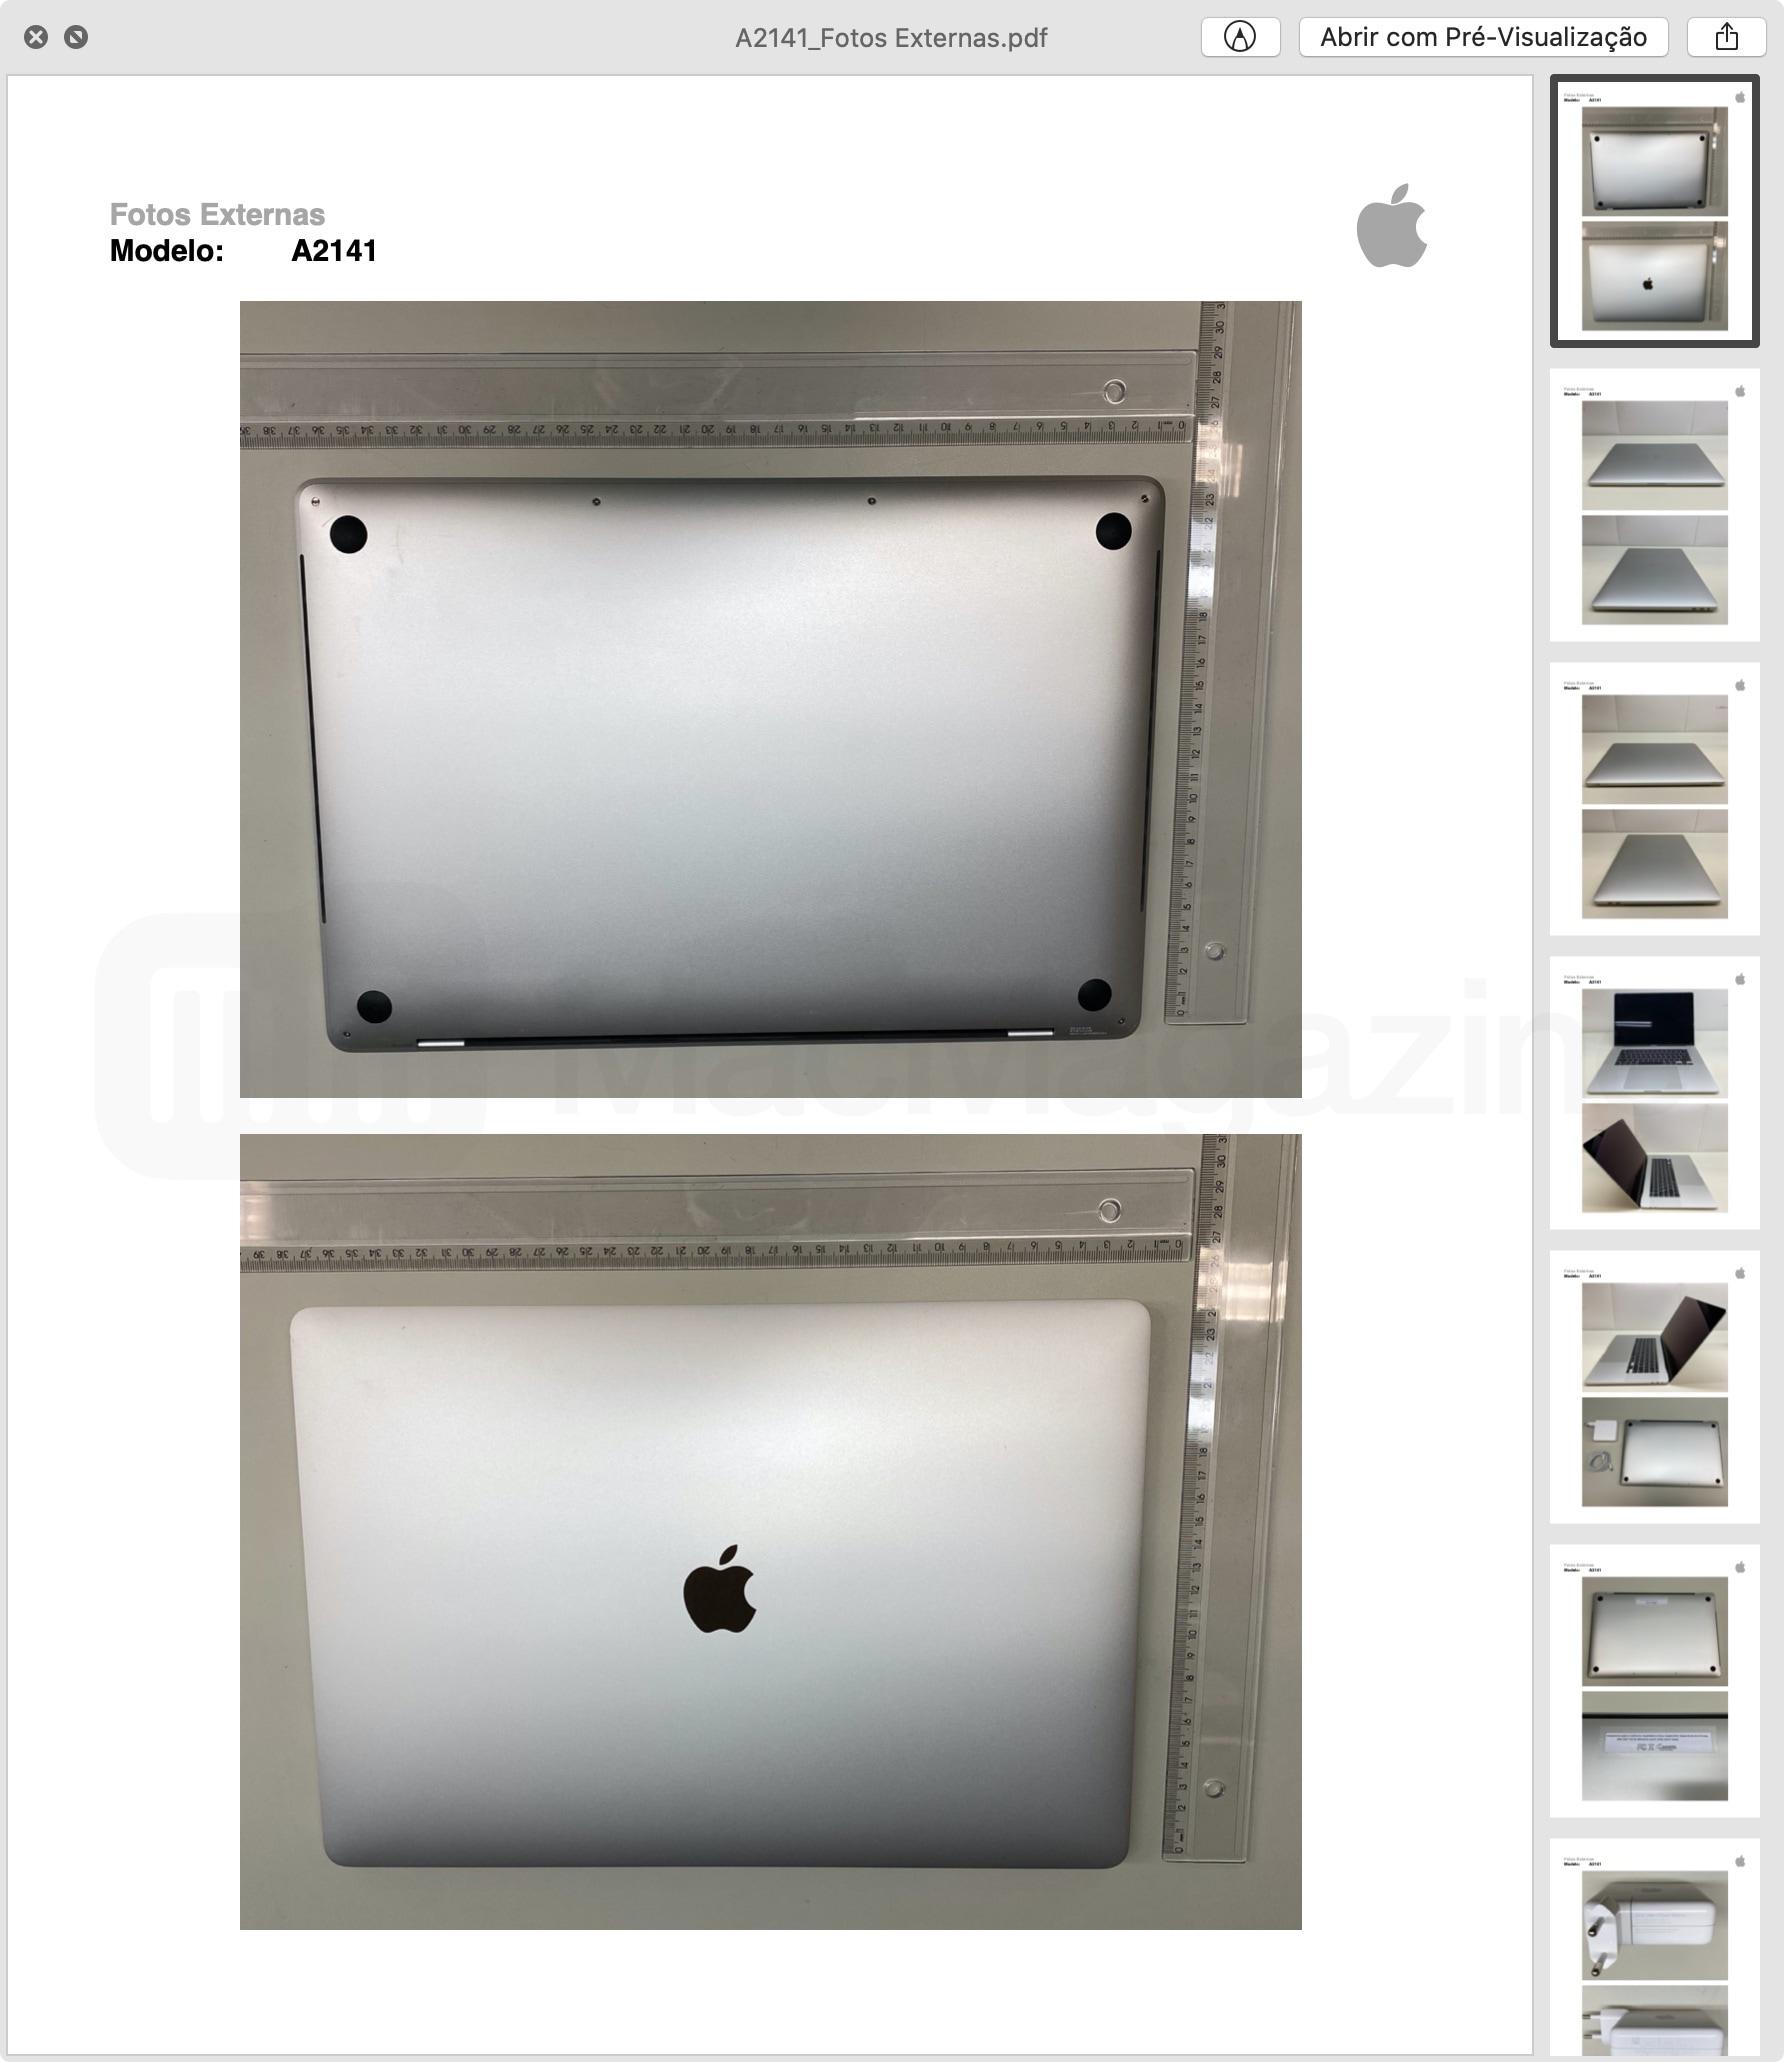 External Photos of MacBook Pro 16 Approval